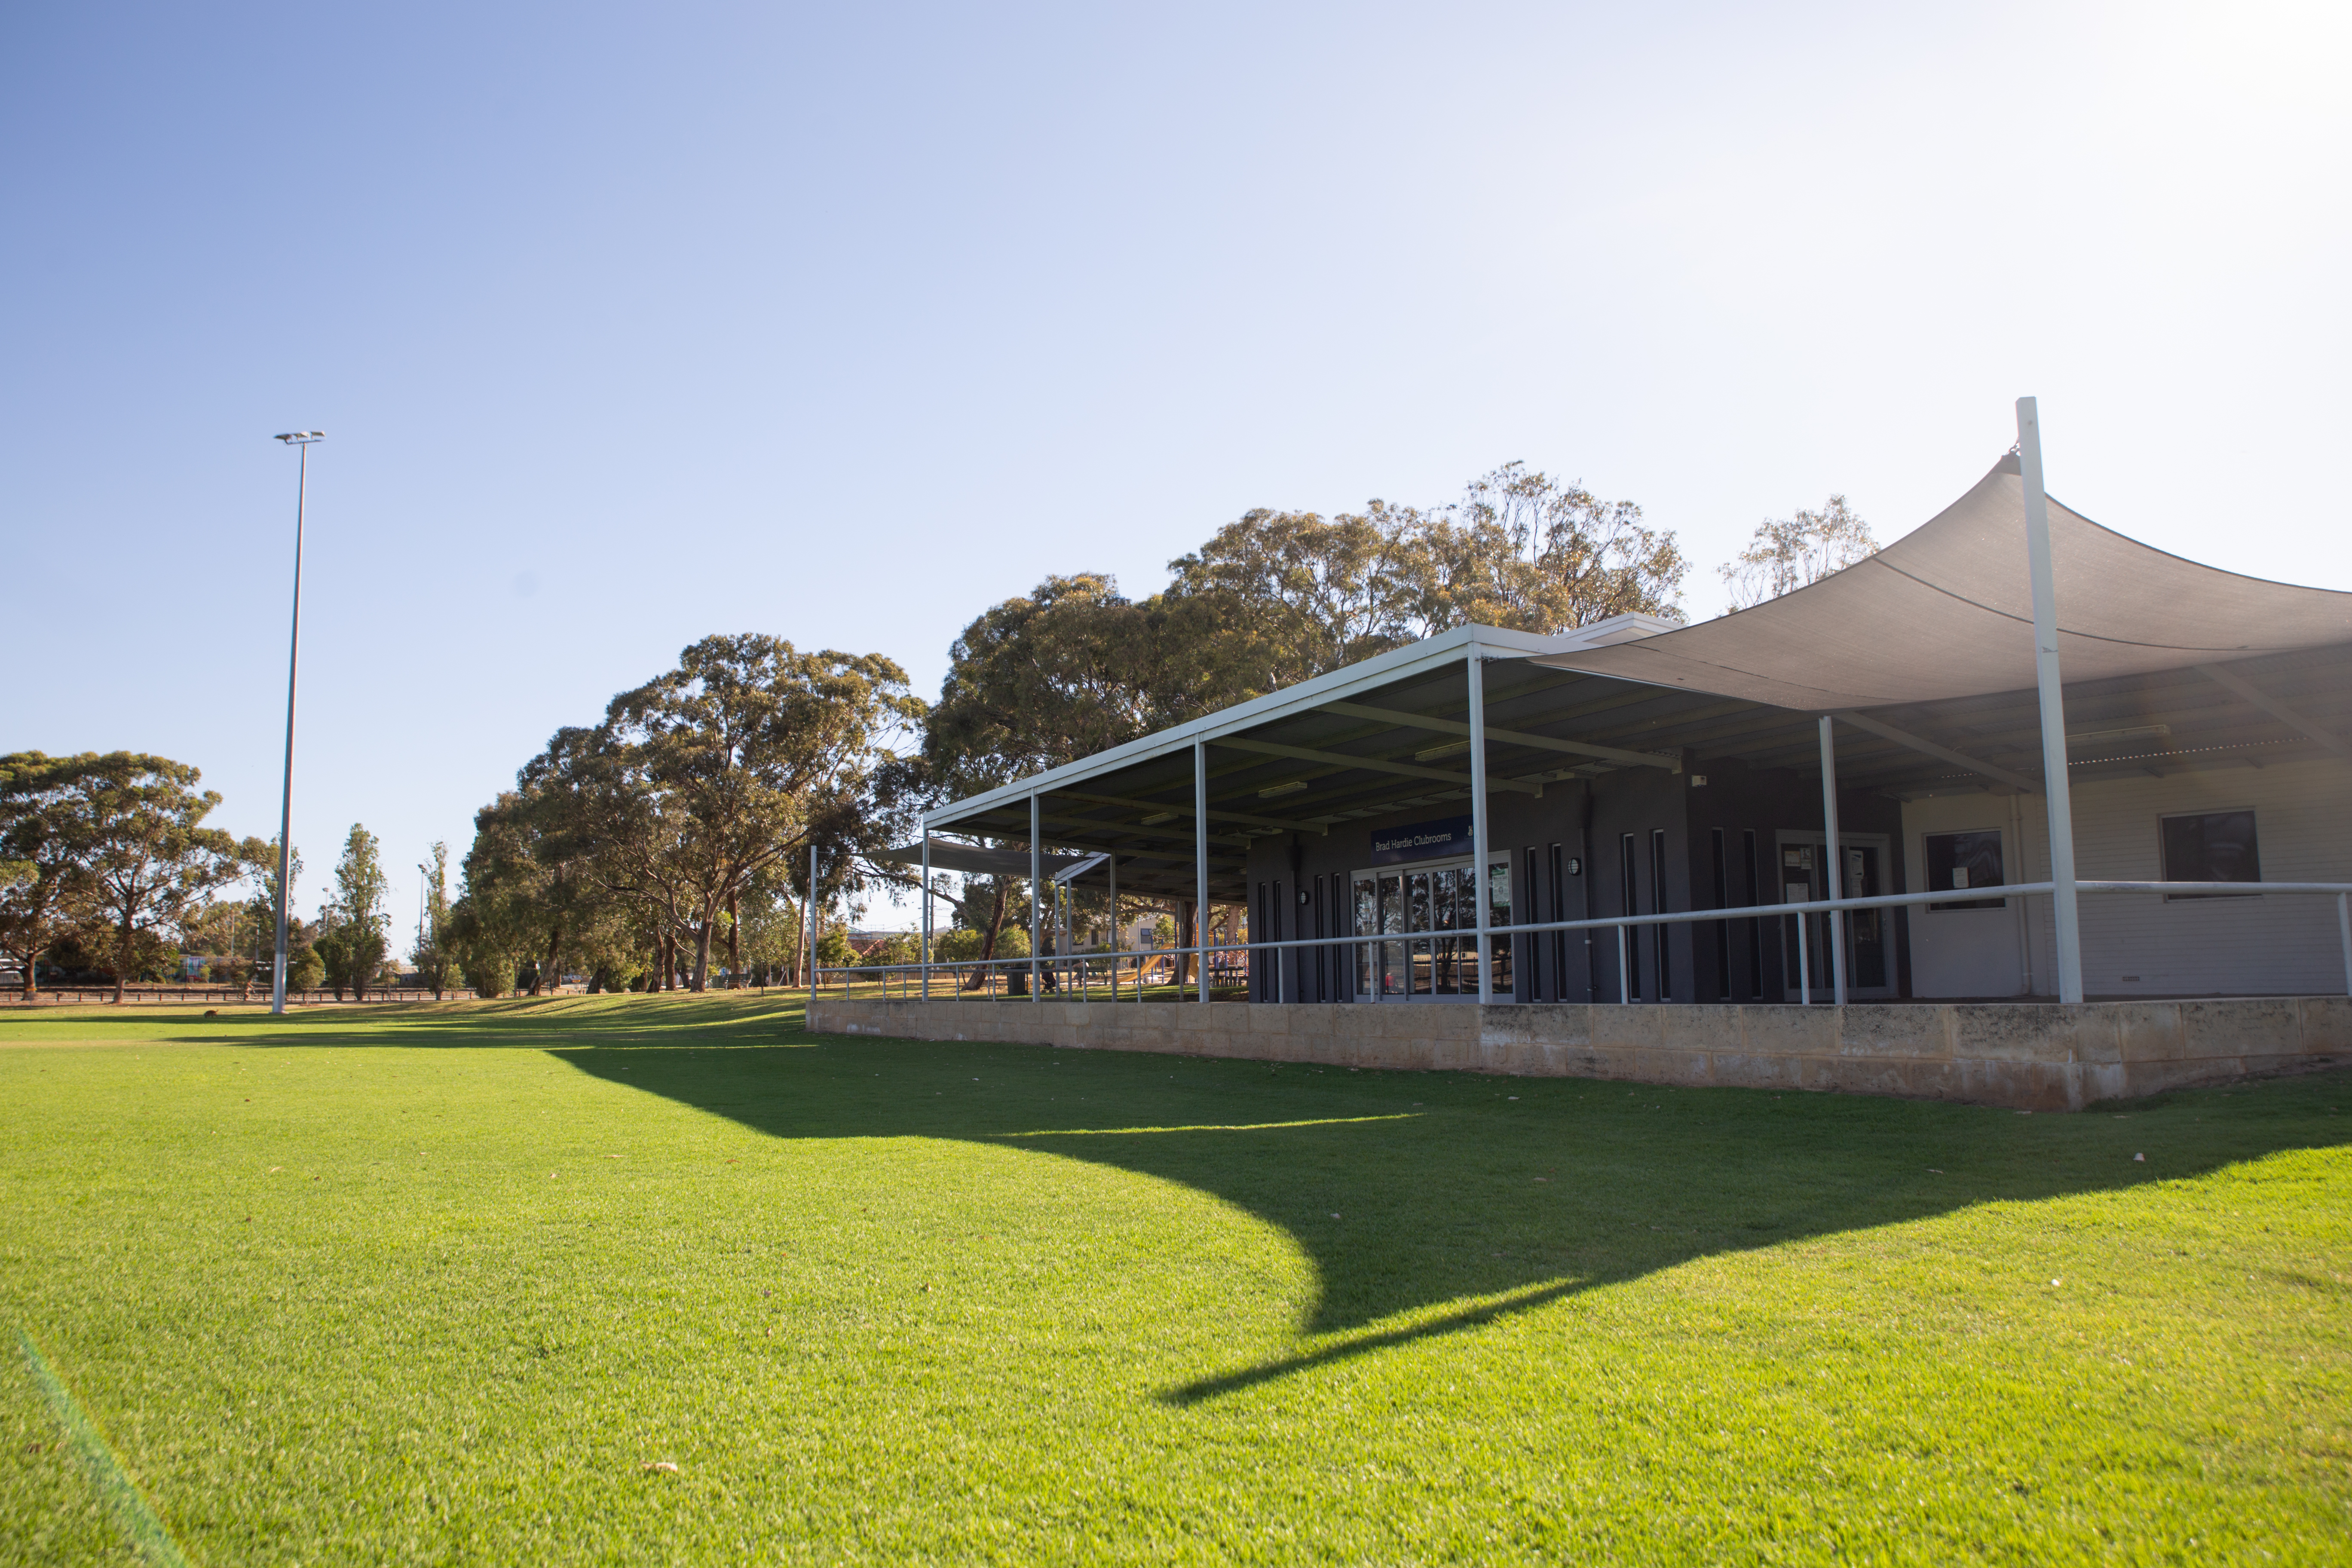 Dick Lawrence Community Hall